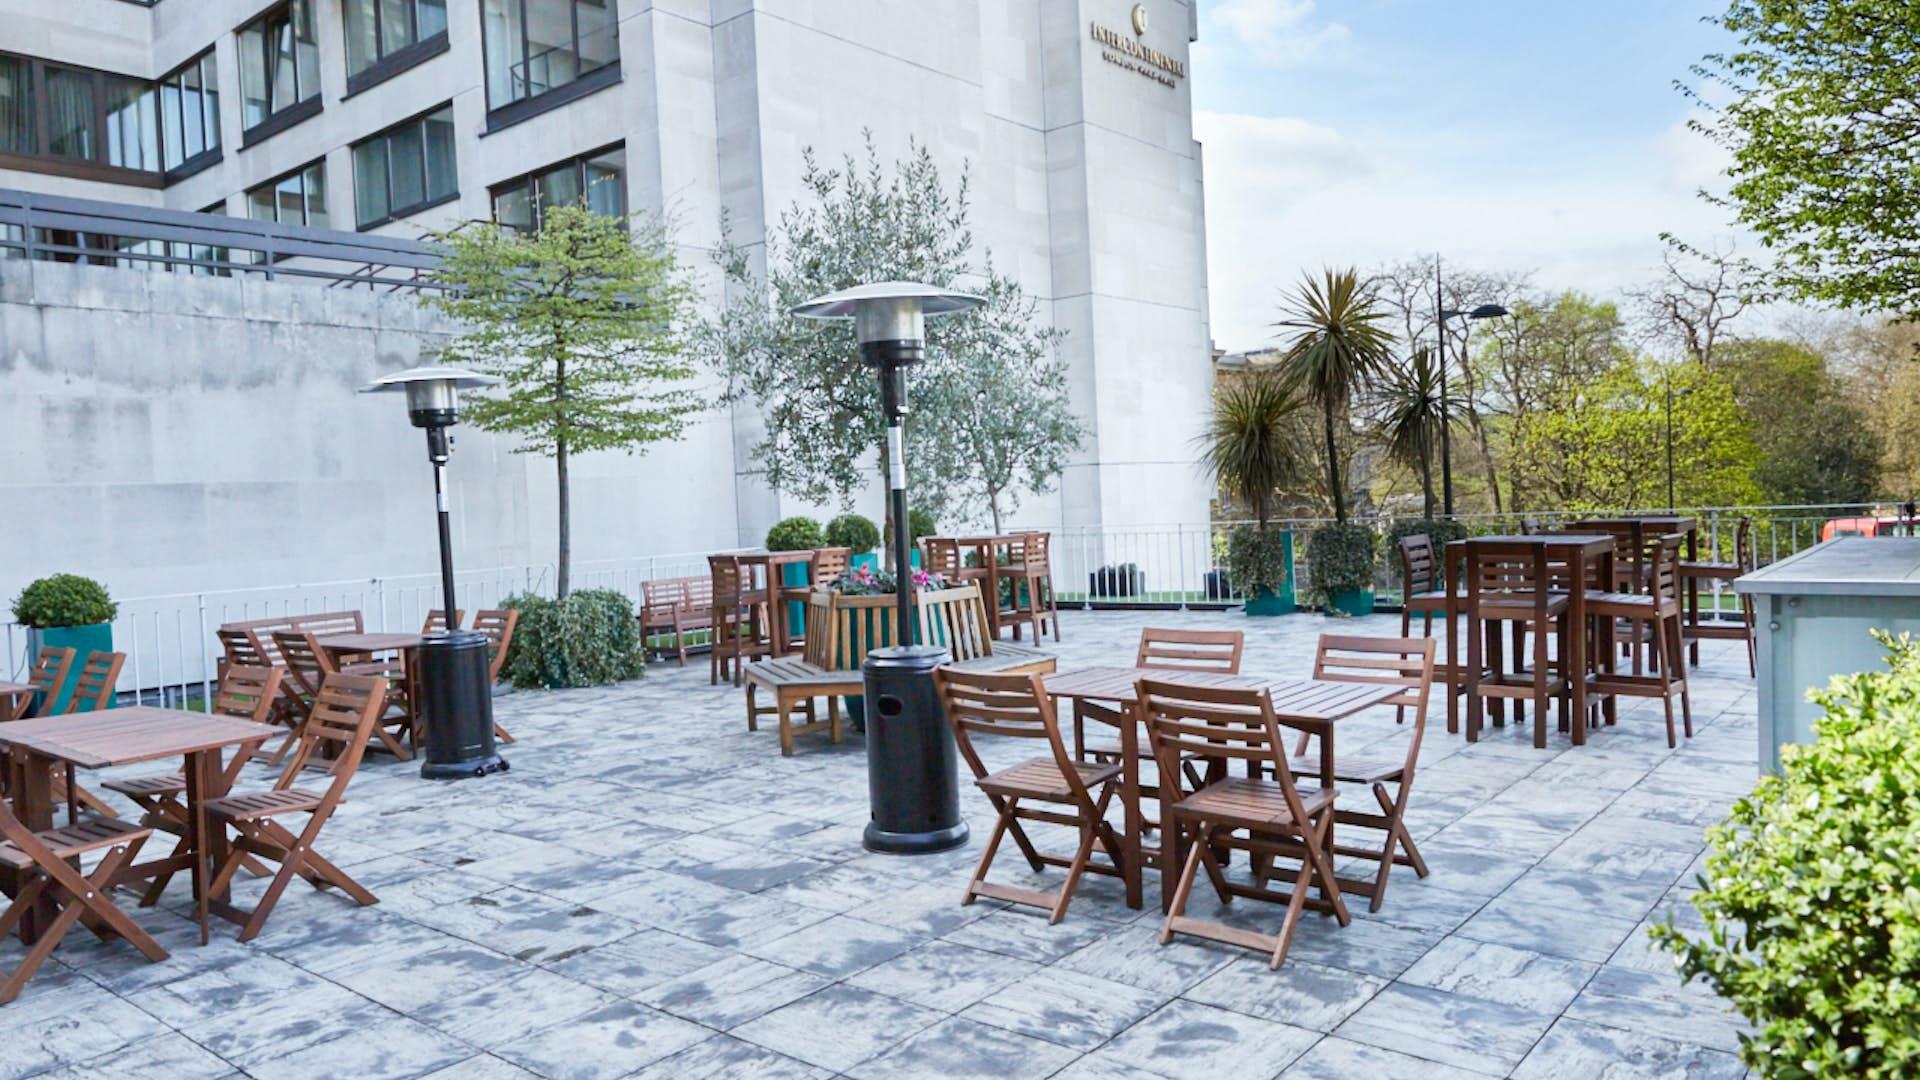 Argyll room and terrace events no 4 hamilton place for 63 hamilton terrace